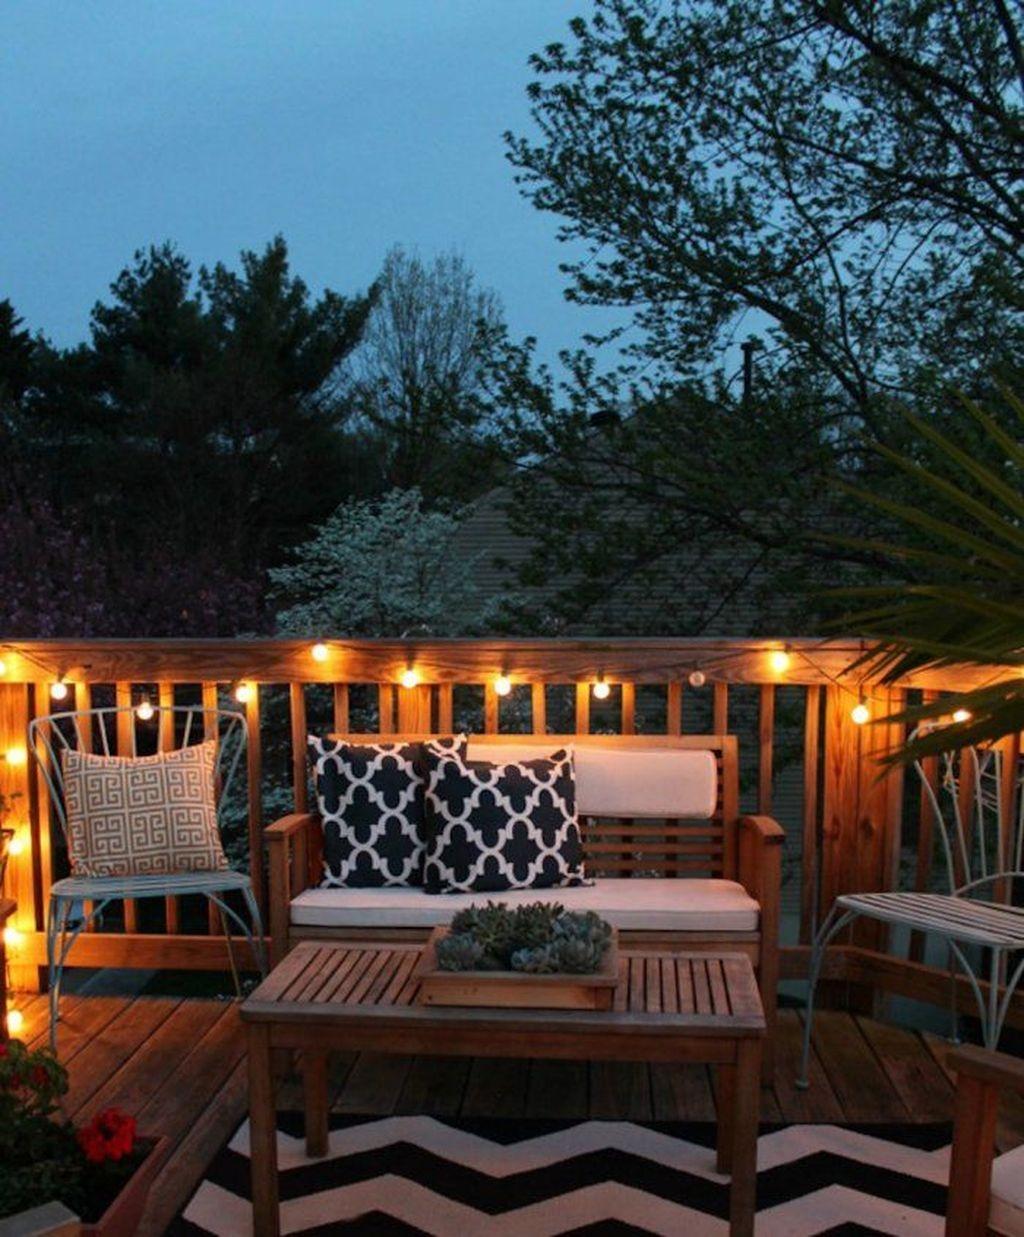 22 Incredible Budget Gardening Ideas: Amazing Backyard Fairy Garden Ideas On A Budget 12